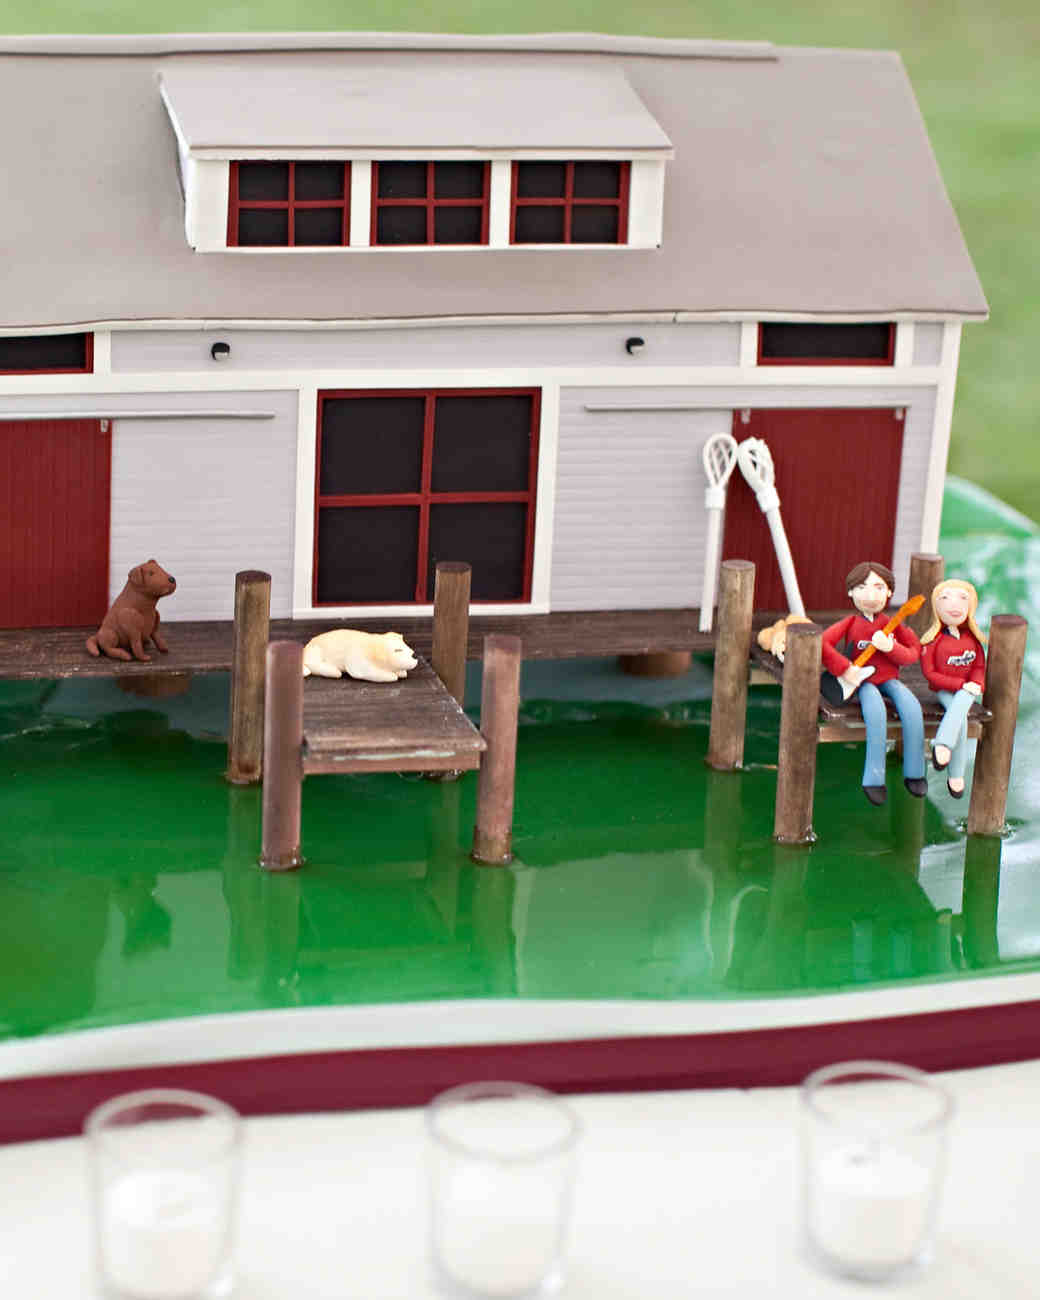 House-Themed Groom's Cake